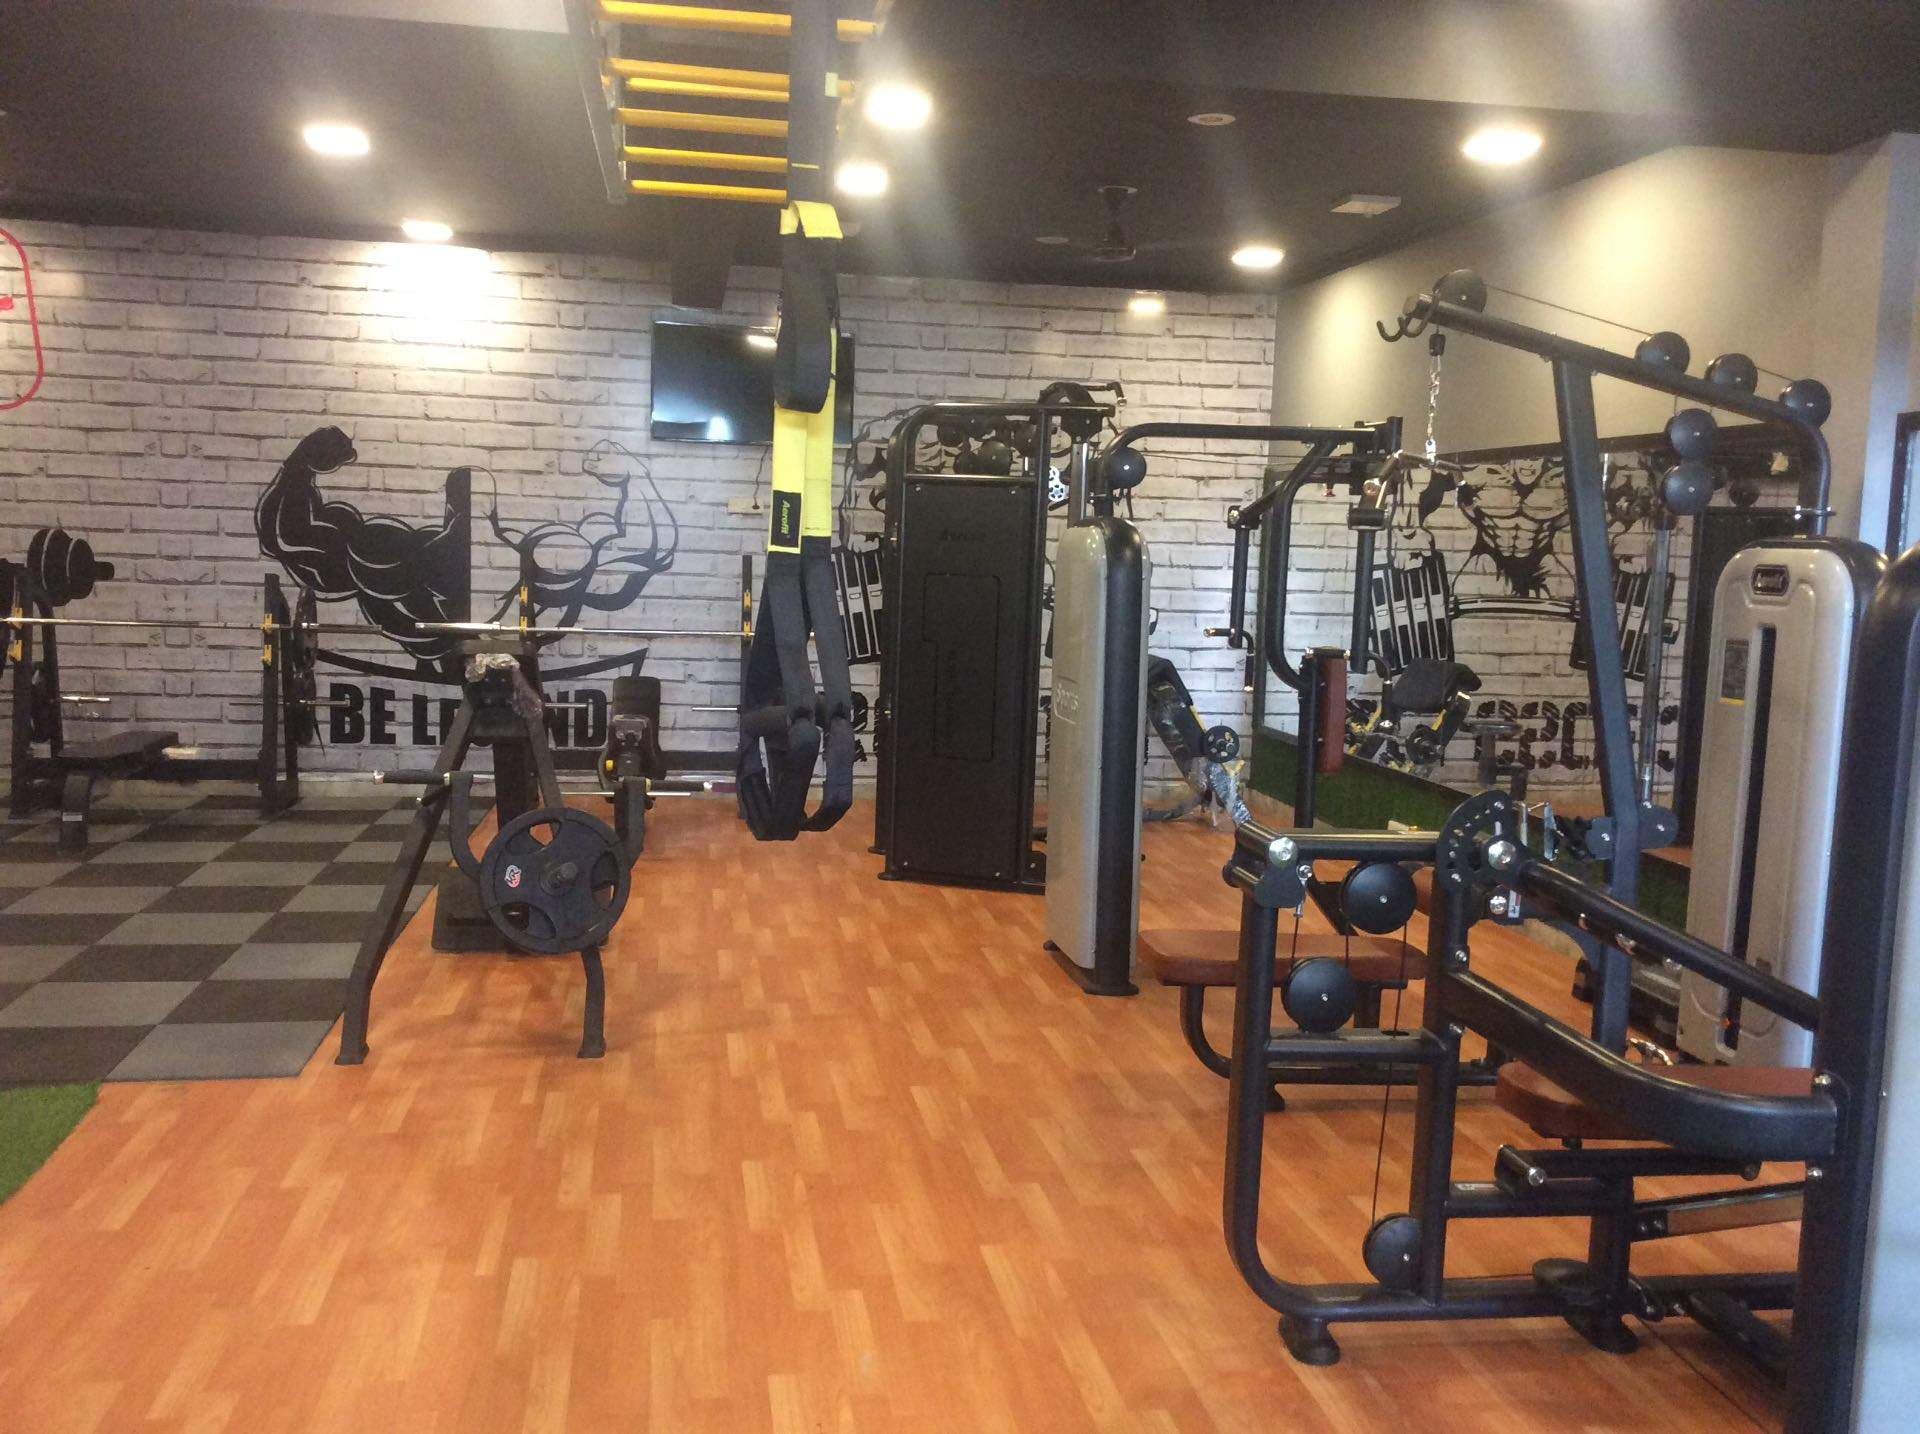 Be Legend Gym And Crossfit Vaishali Nagar